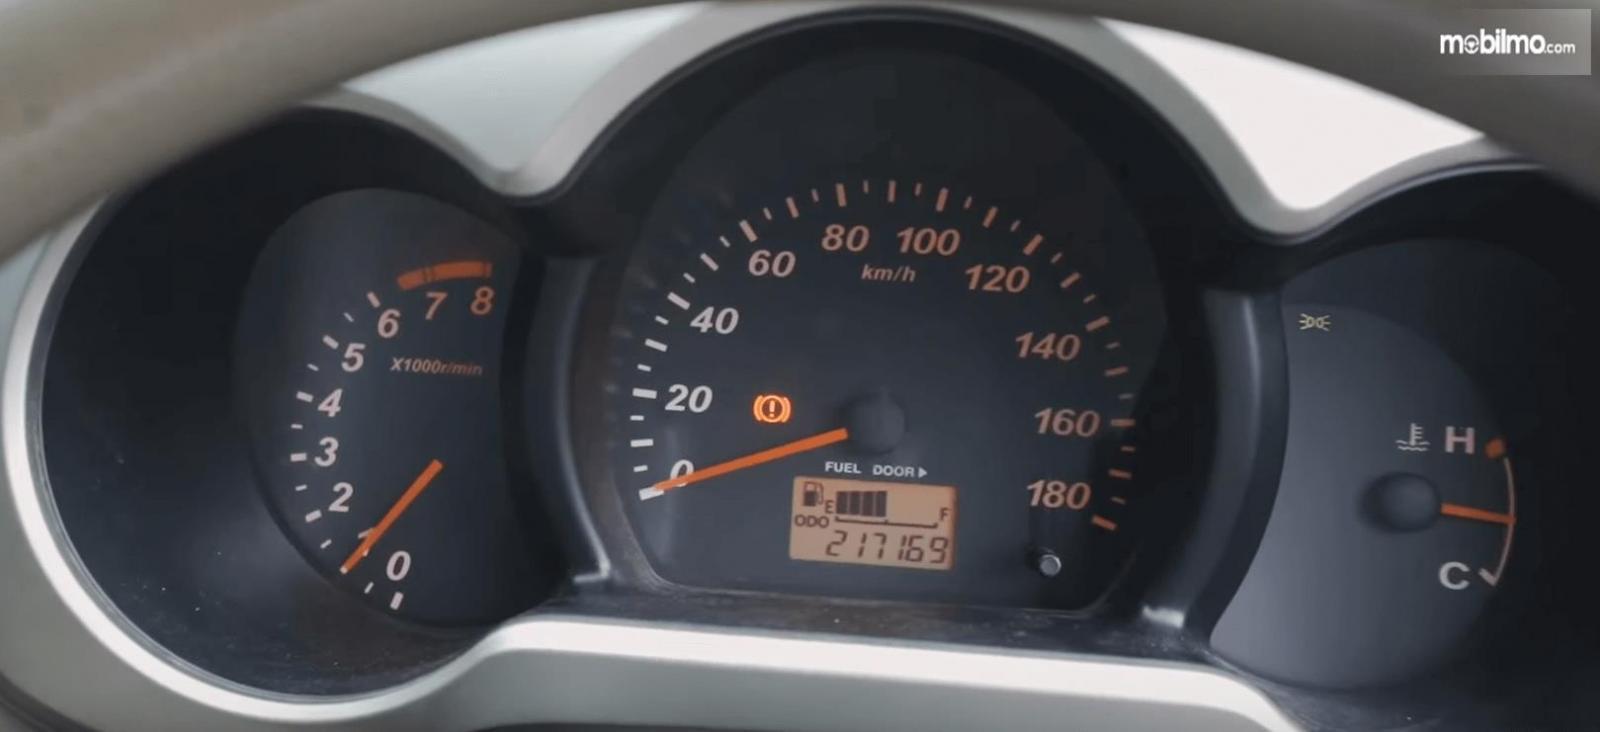 Gambar ini menunjukkan panel instrumen Daihatsu Terios TS Extra MT 2008